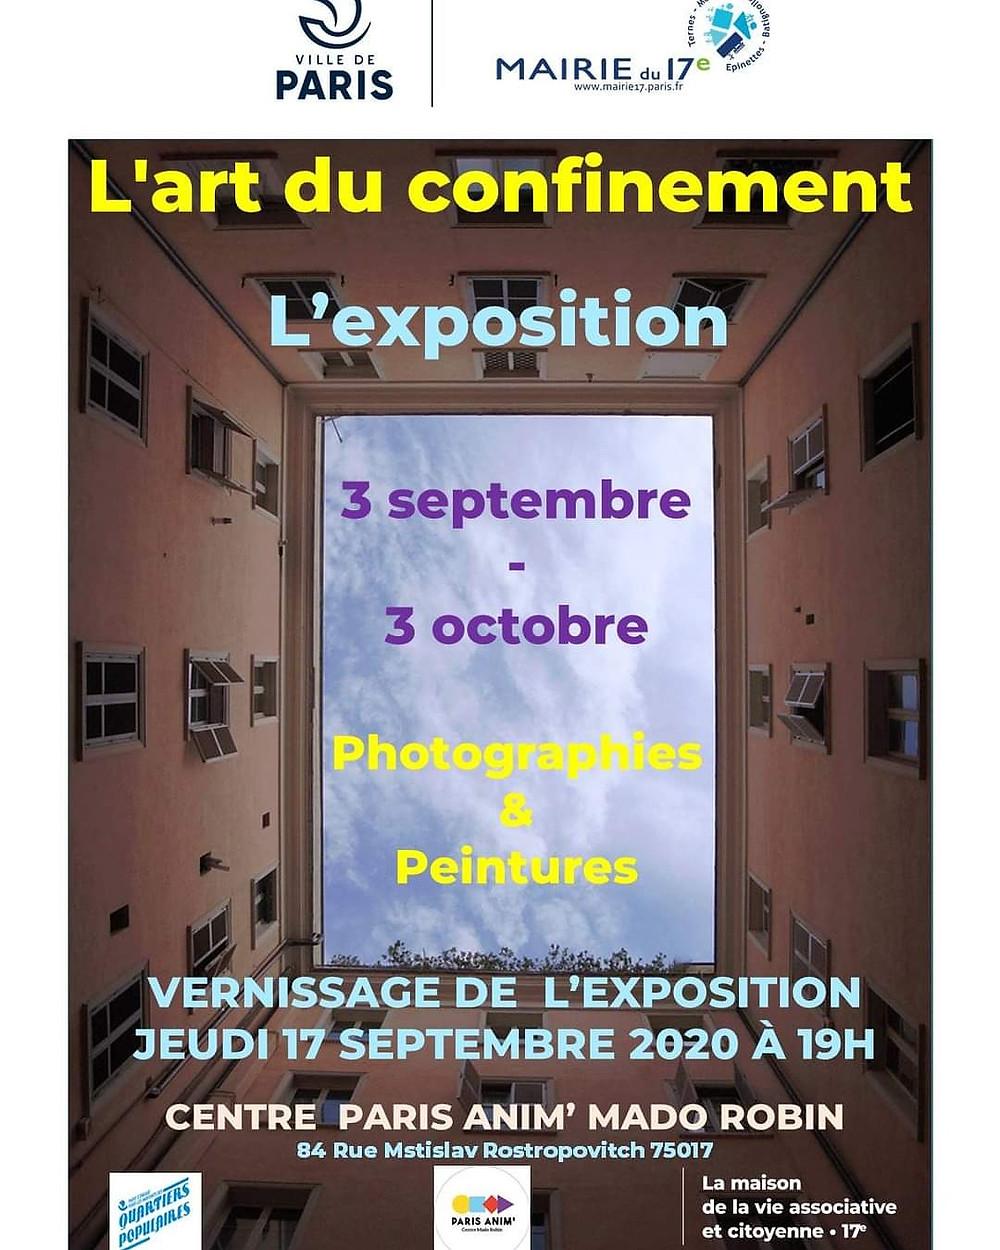 Exposition du 3 septembre au 3 octobre au centre Paris Anim Mado Robin XVIIeme